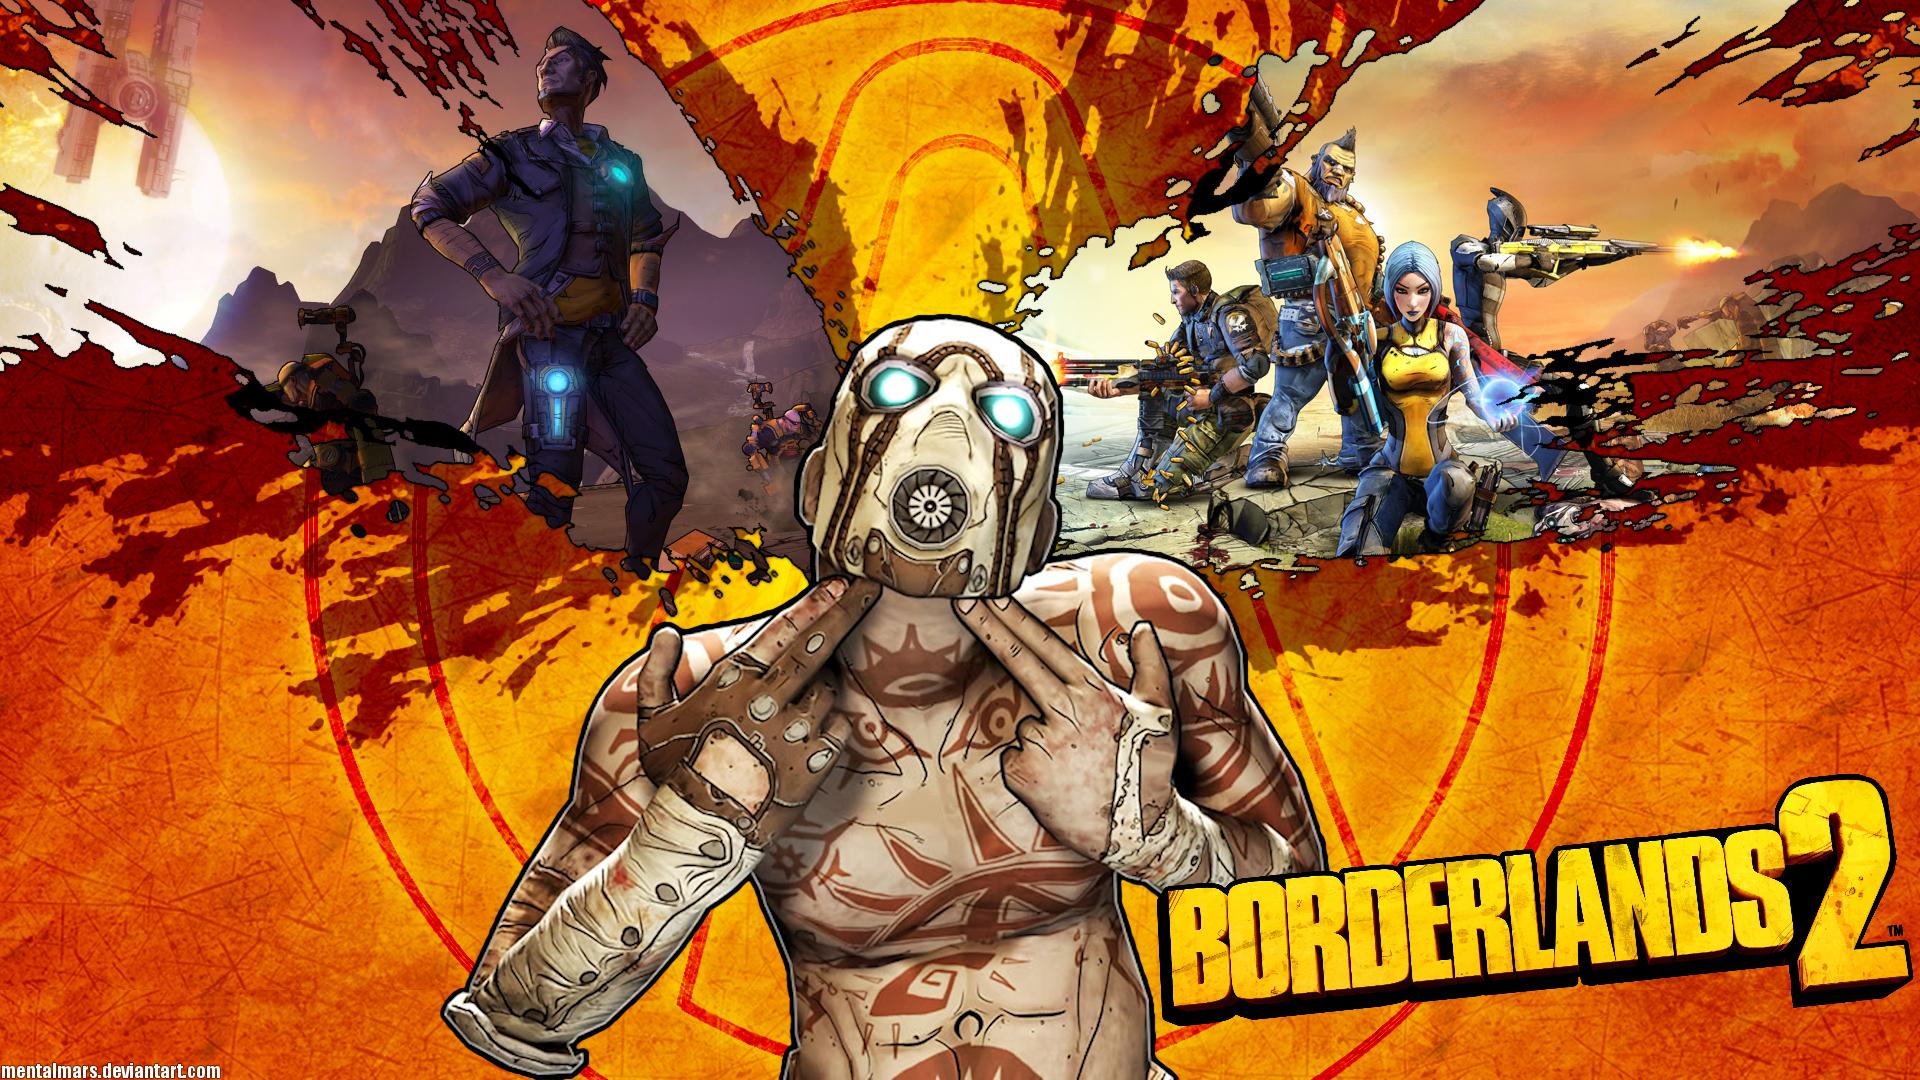 Cool Borderlands 2 Wallpaper